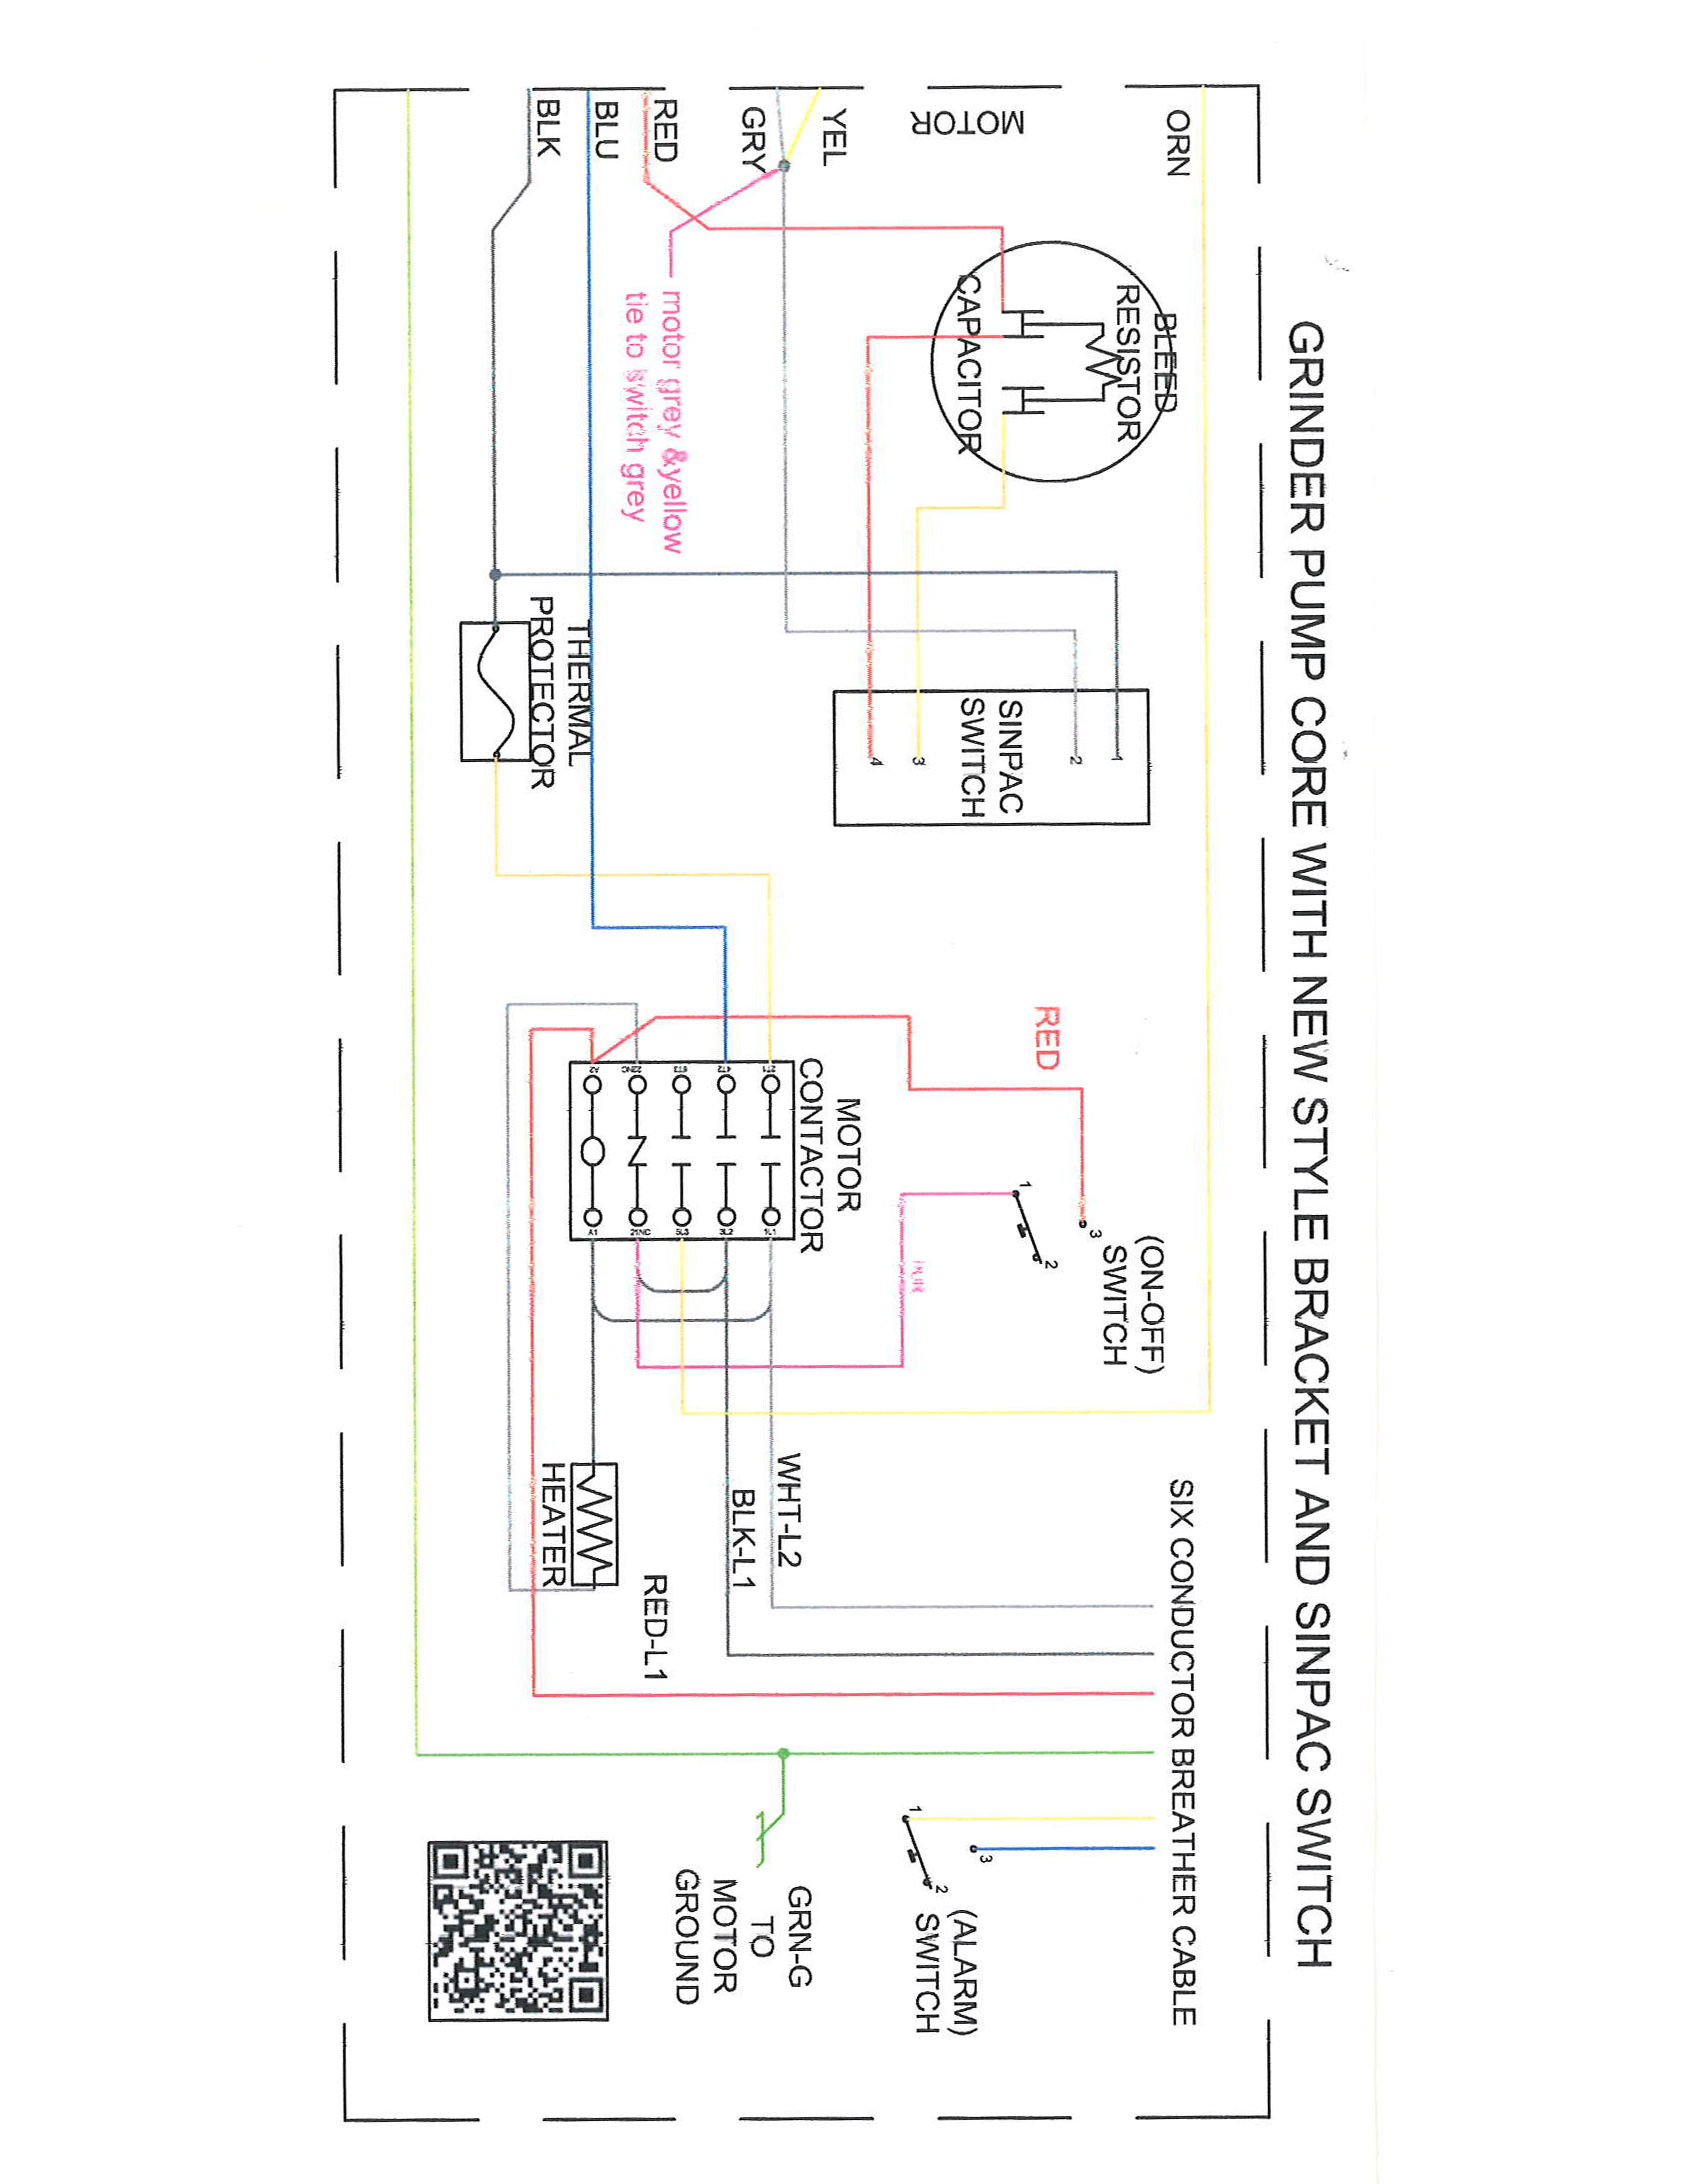 Hydromatic Pump Wiring Diagram - 2001 Suzuki Vitara Engine Wiring Diagram  Hecho - jeepe-jimny.pujaan-hati.jeanjaures37.fr | Hydromatic Pump Wiring Diagram |  | Wiring Diagram - Wiring Diagram Resource